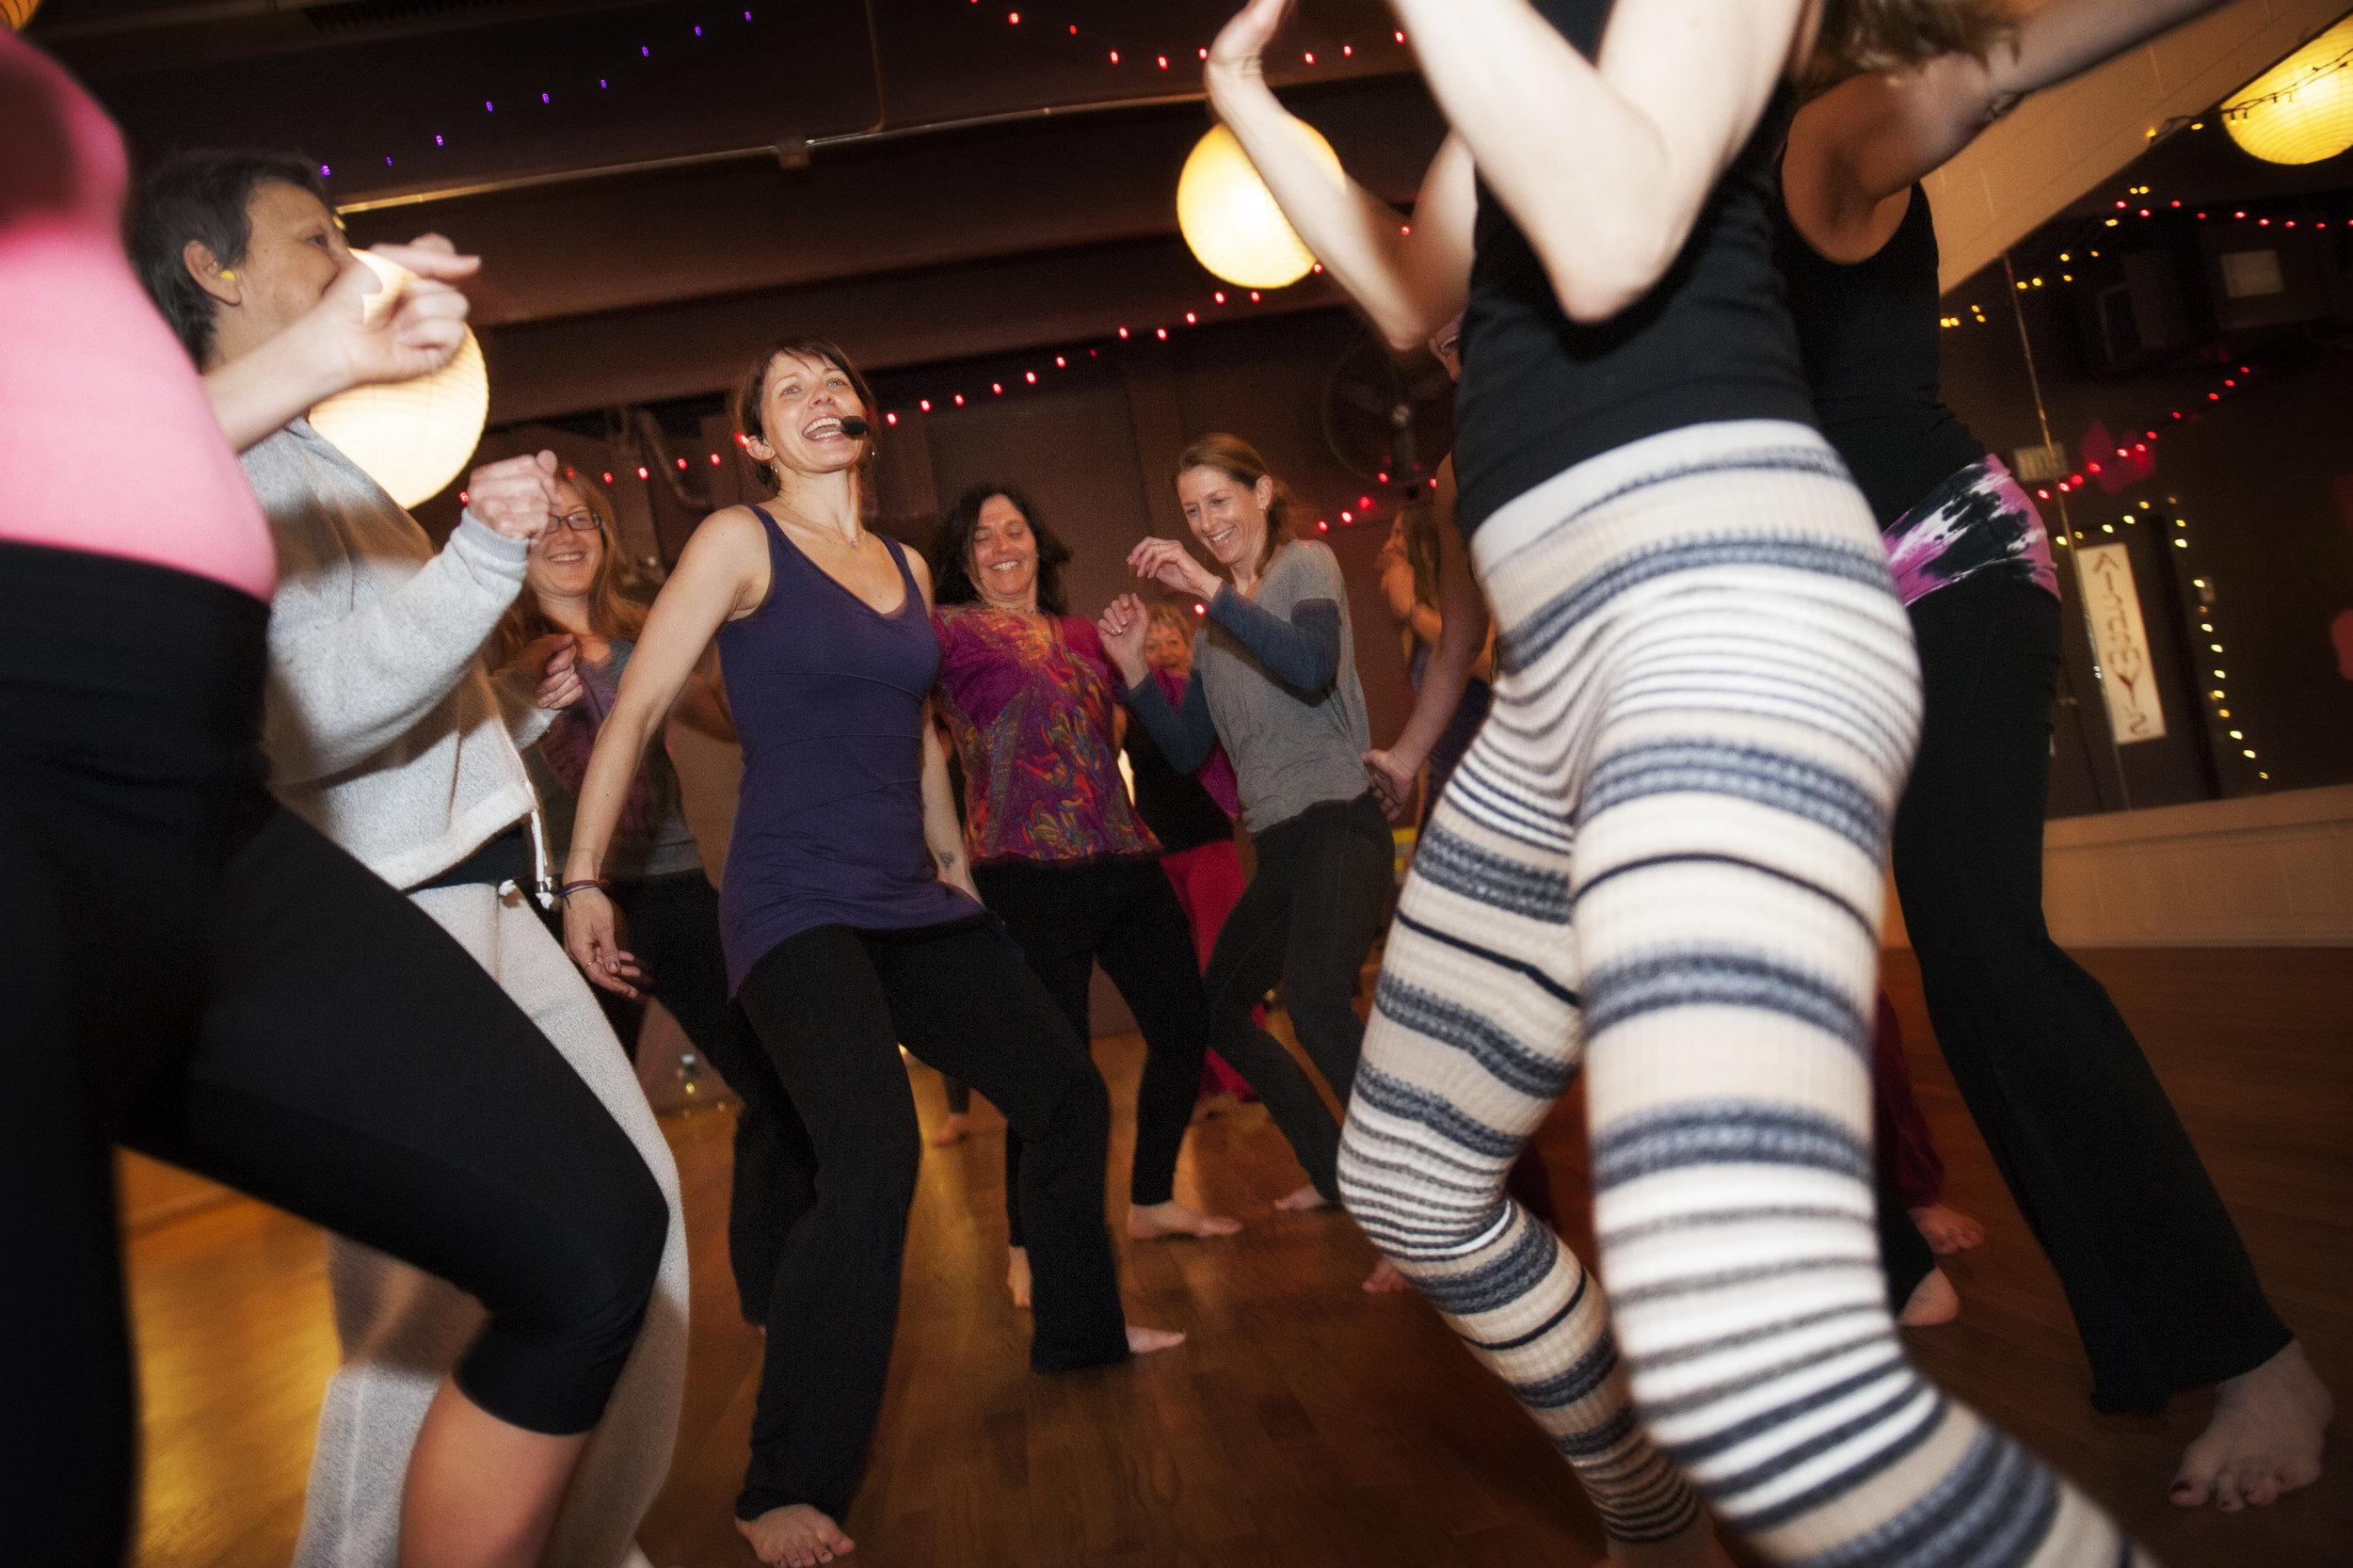 Photo by Johannah Reimer at Awaken The Dance